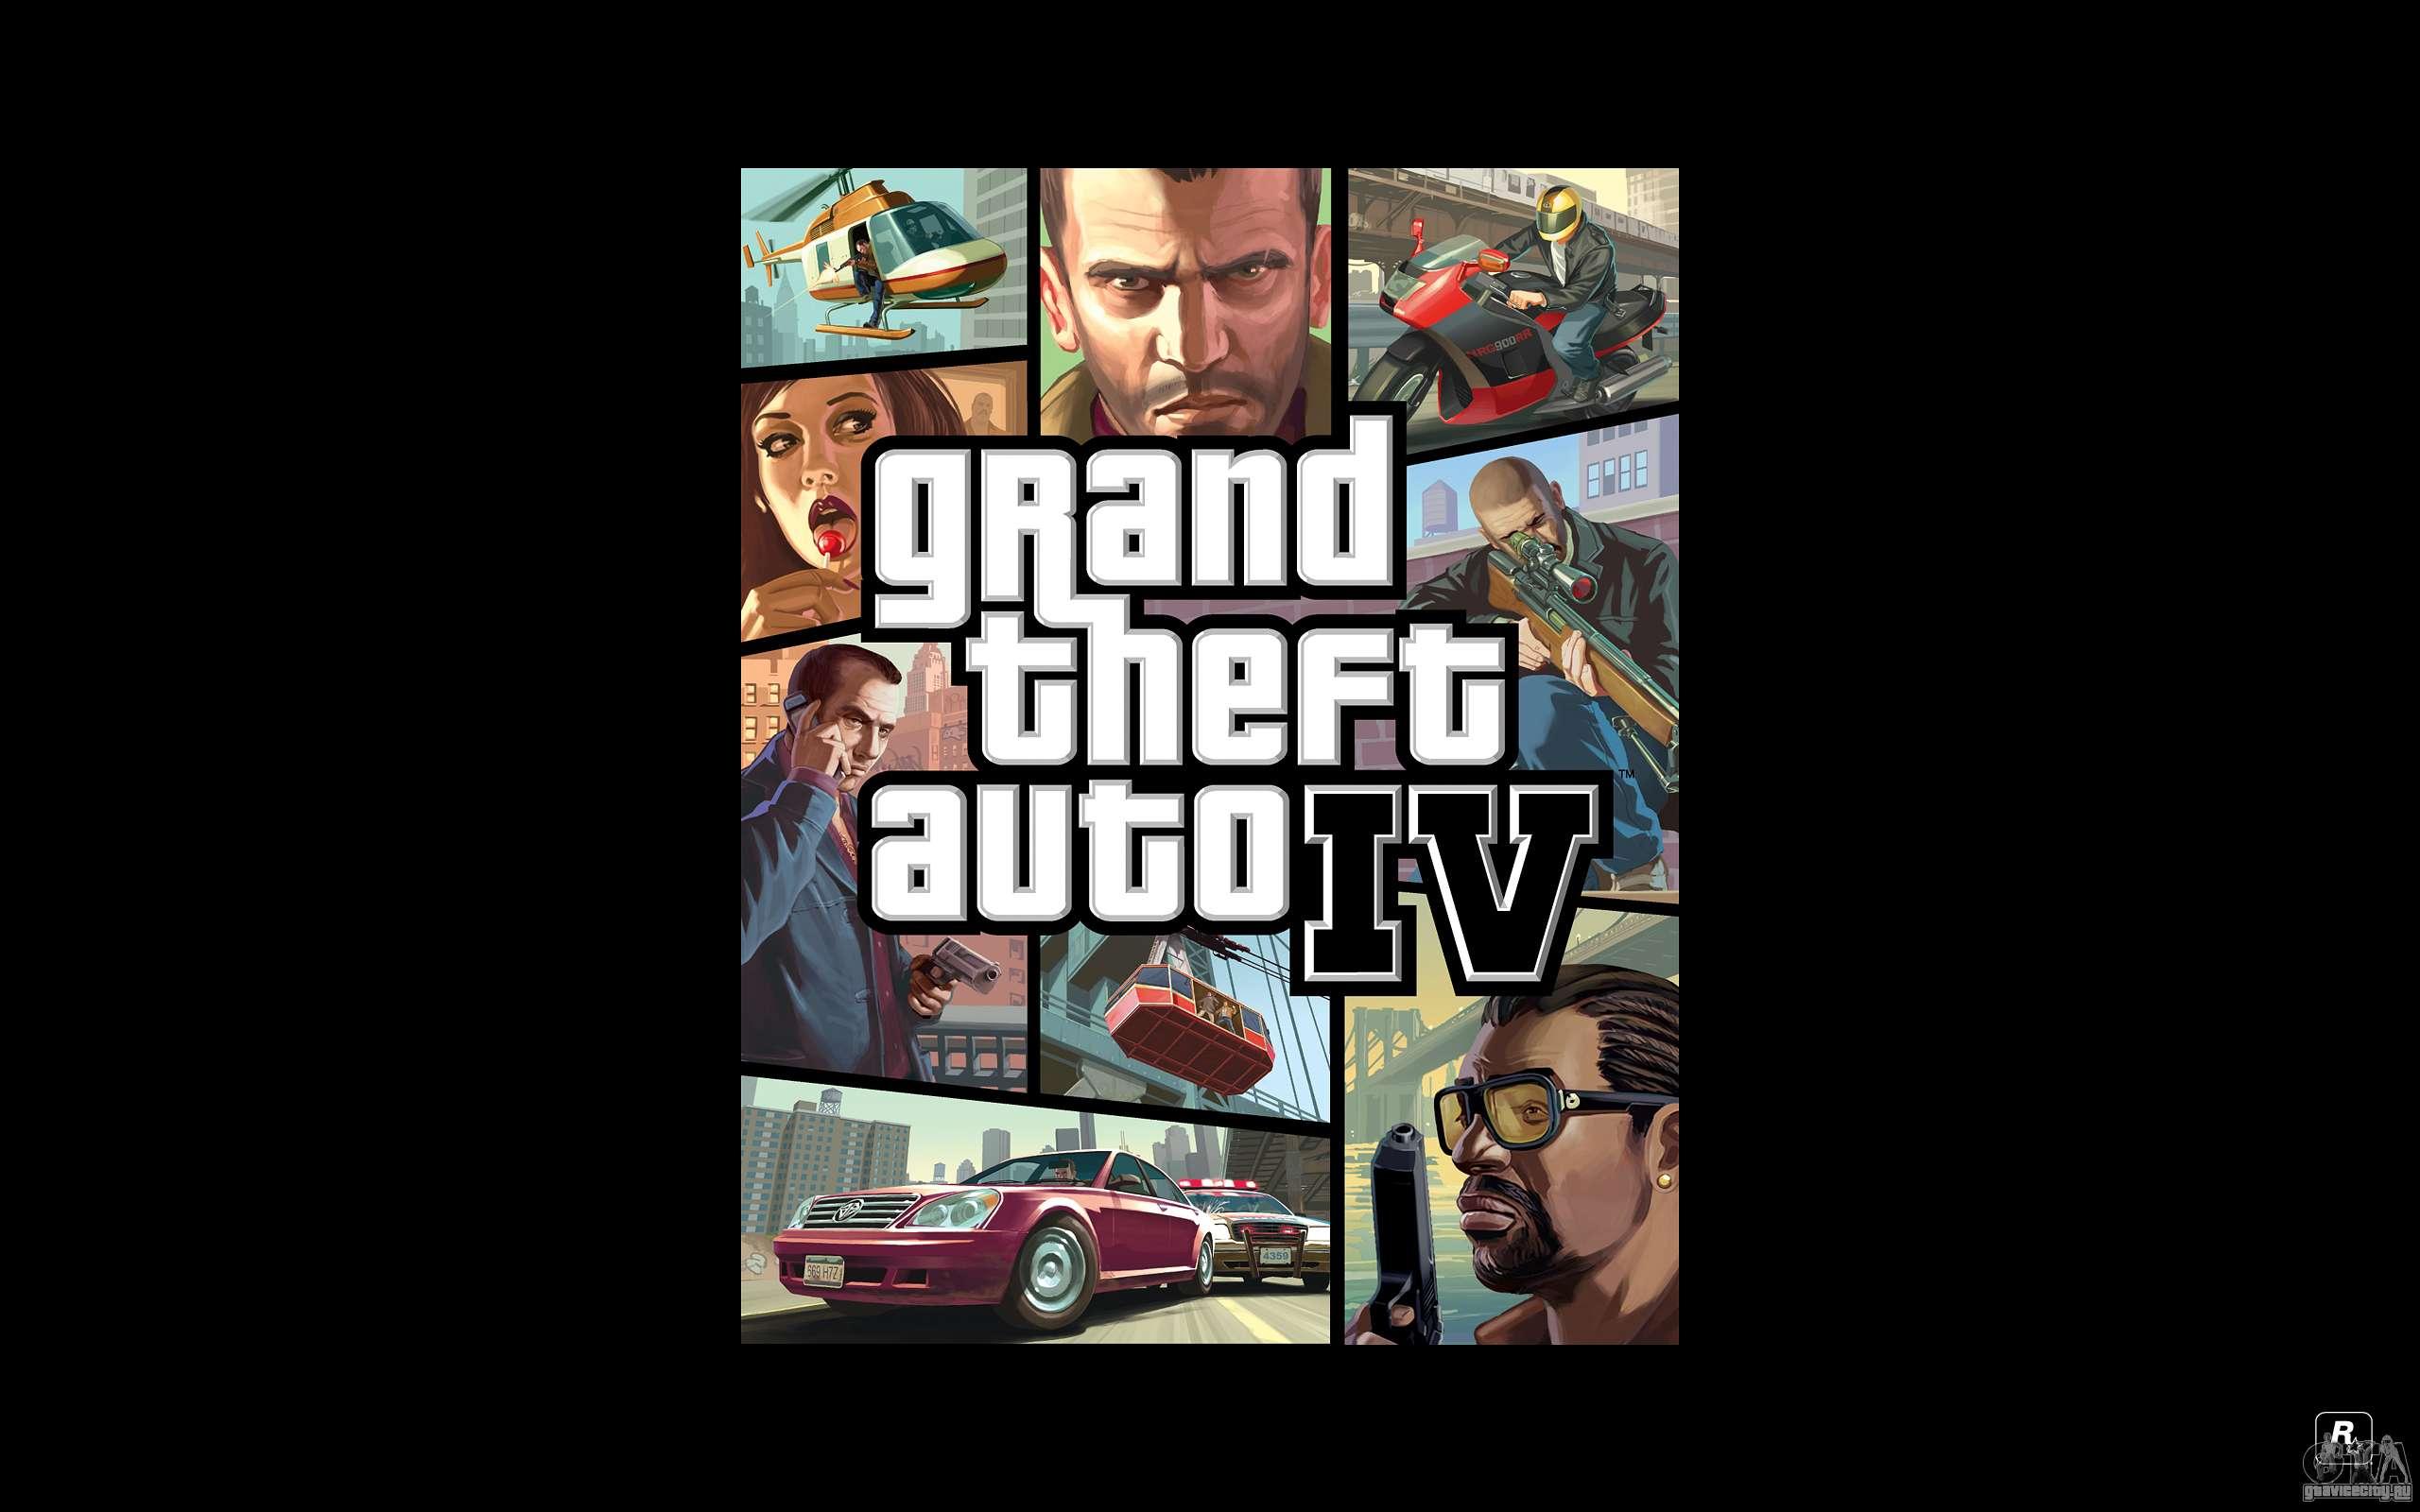 Grand theft auto iv pc (4gb) utorrent game.